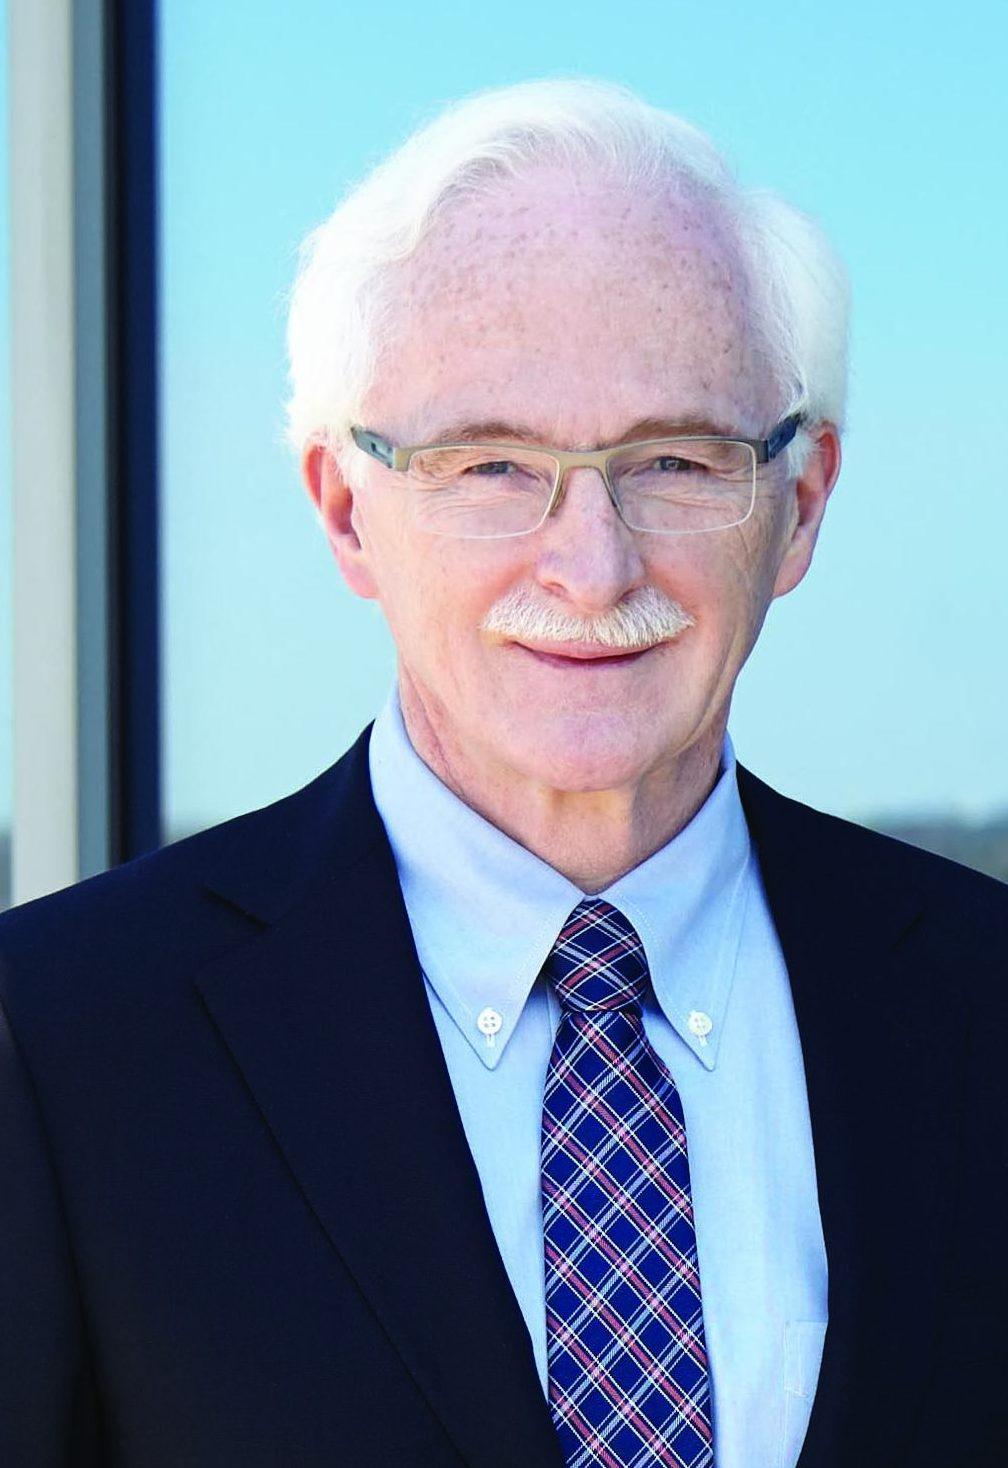 Alex Miller, president, Esri Canada